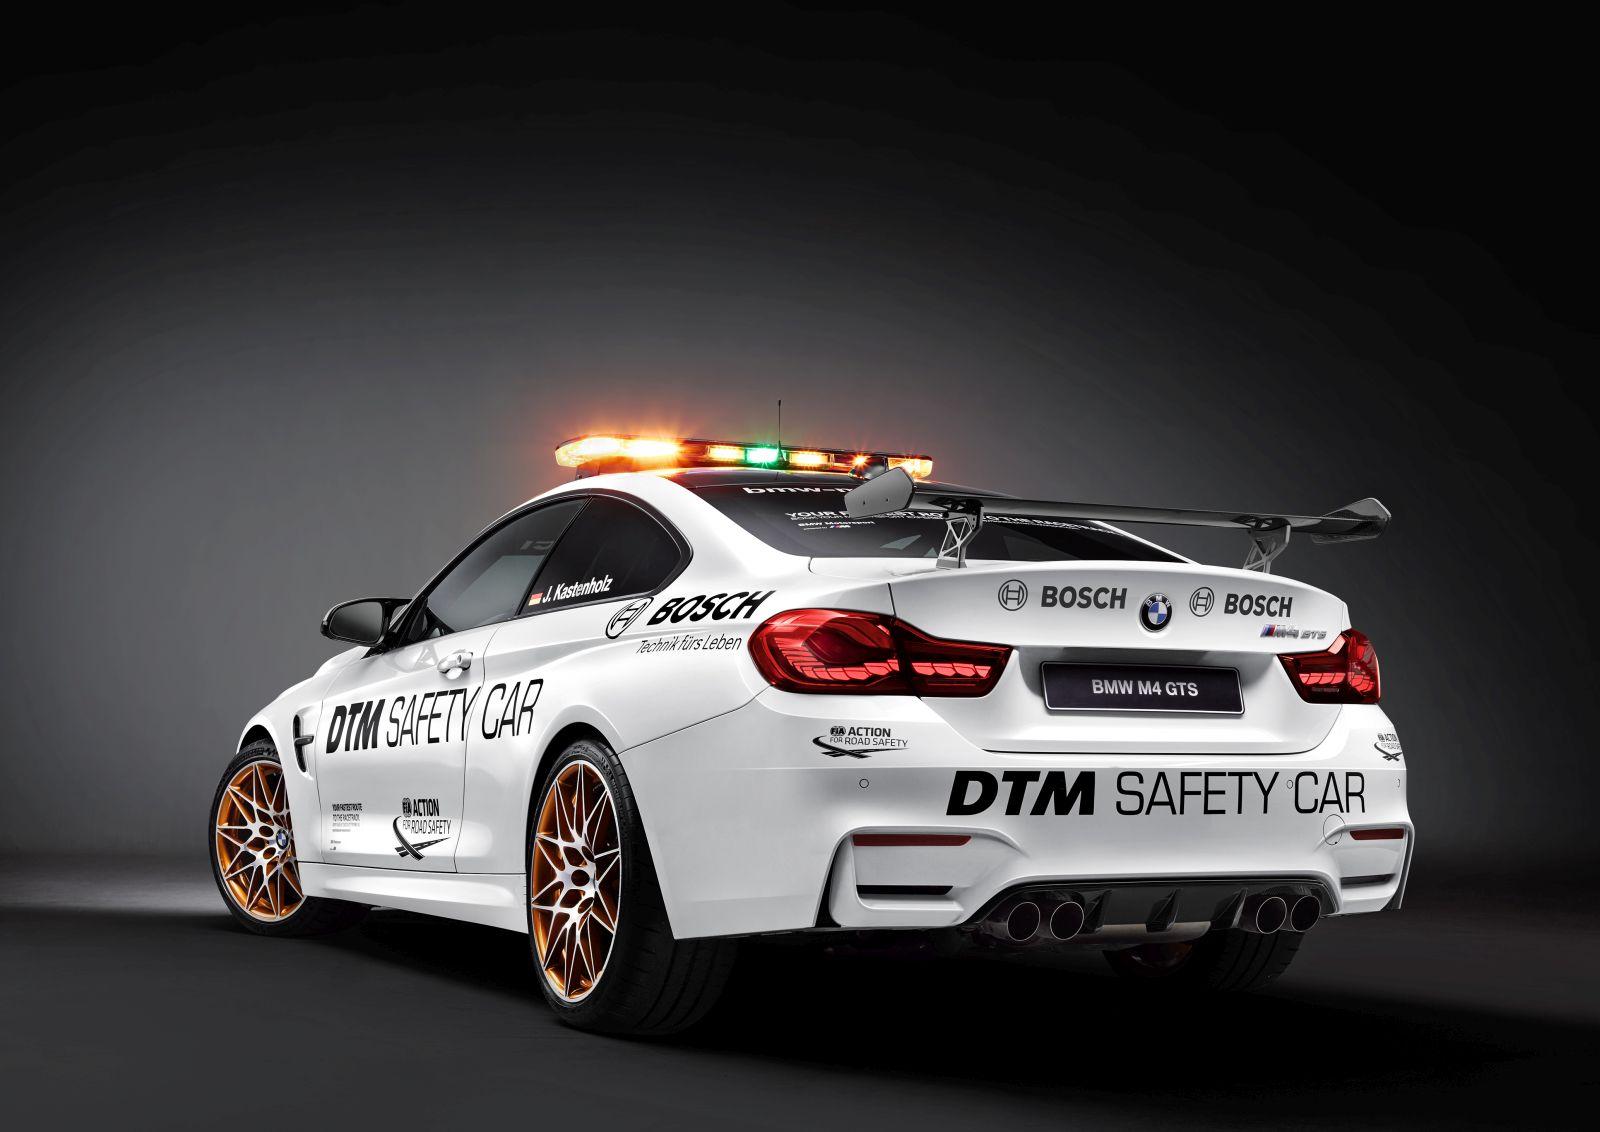 BMW M4 GTS - DTM Safety Car (2)